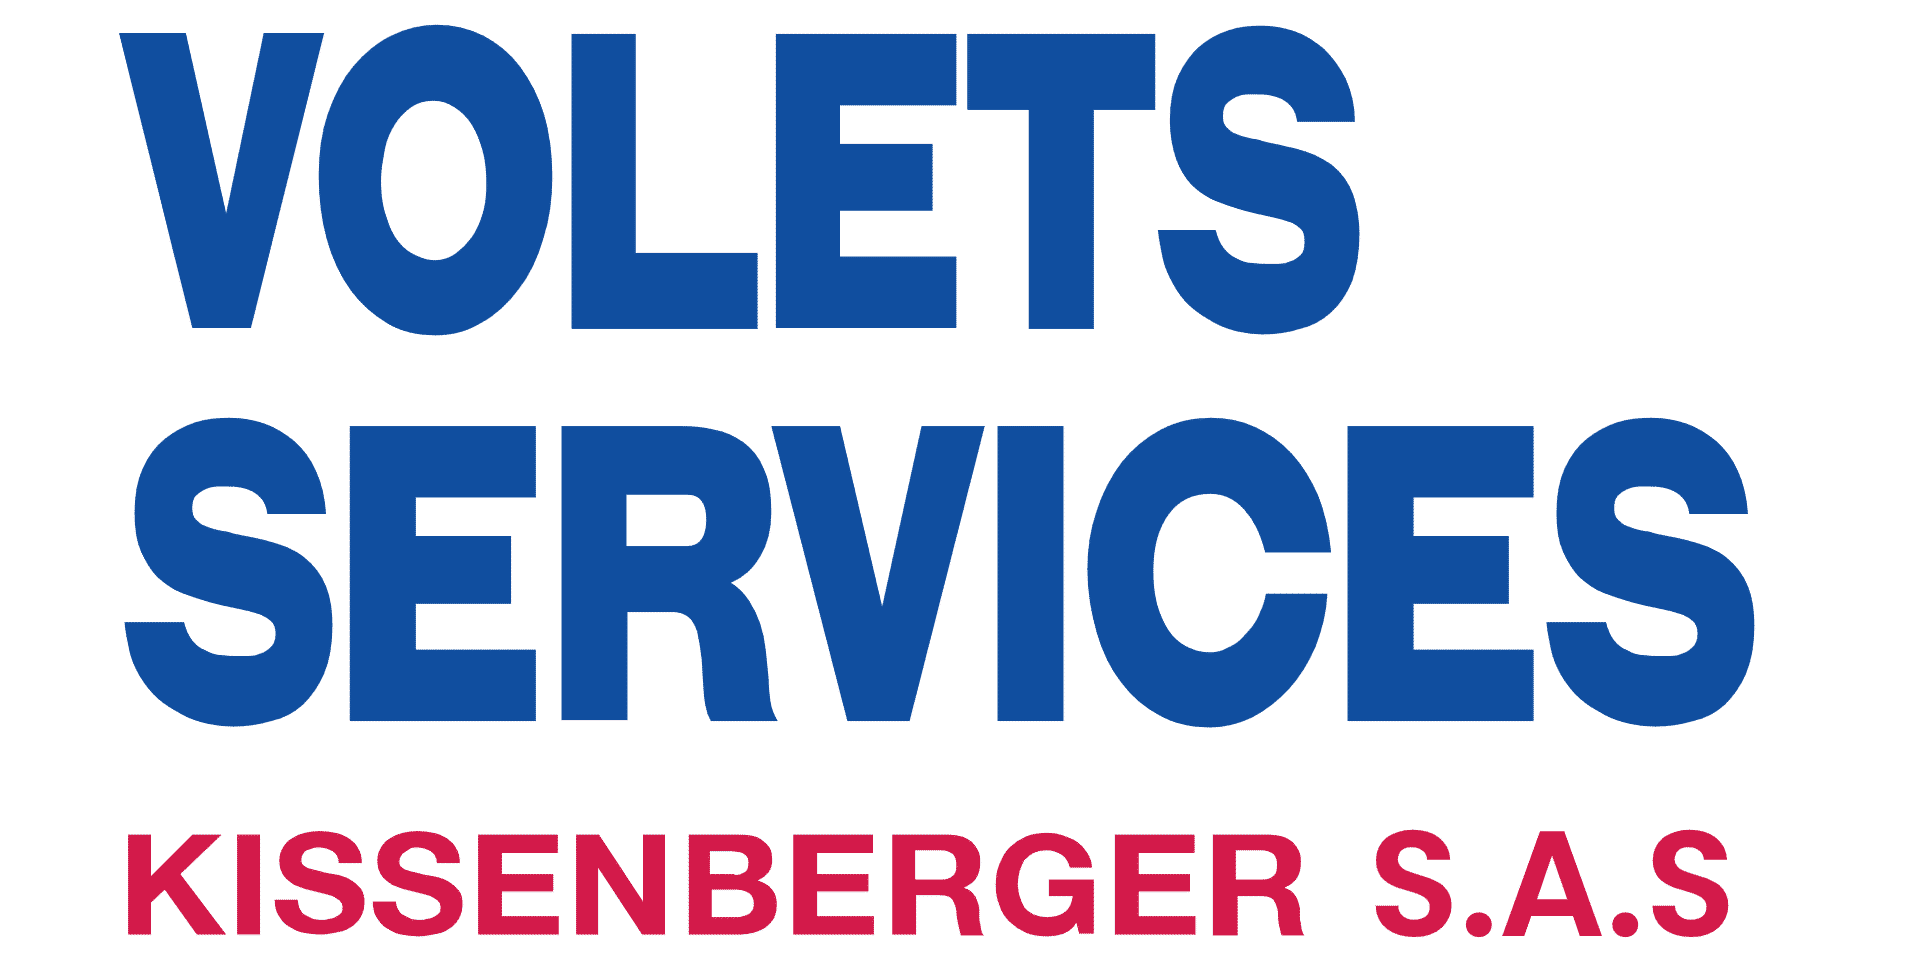 Volets Services Kissenberger